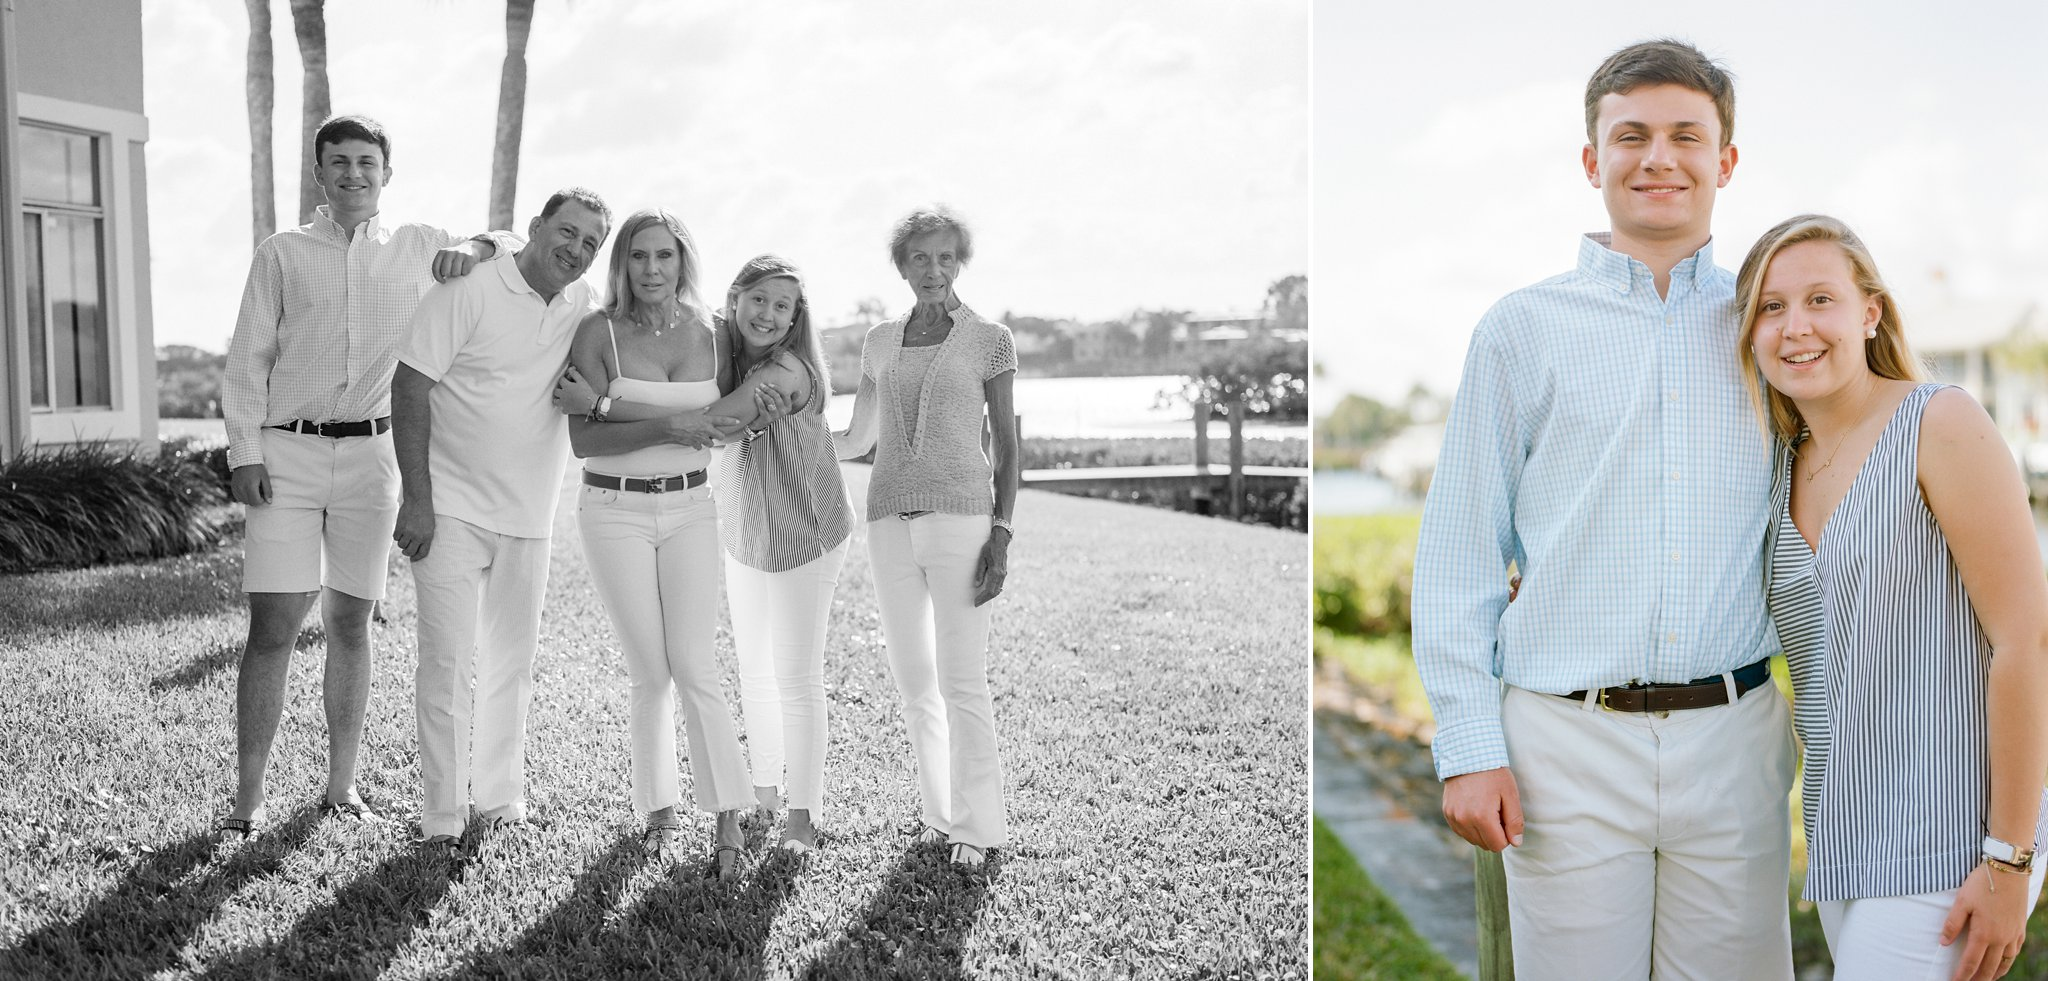 jupiter beach family photographer admirals cove photographer shannon griffin photography_0005.jpg